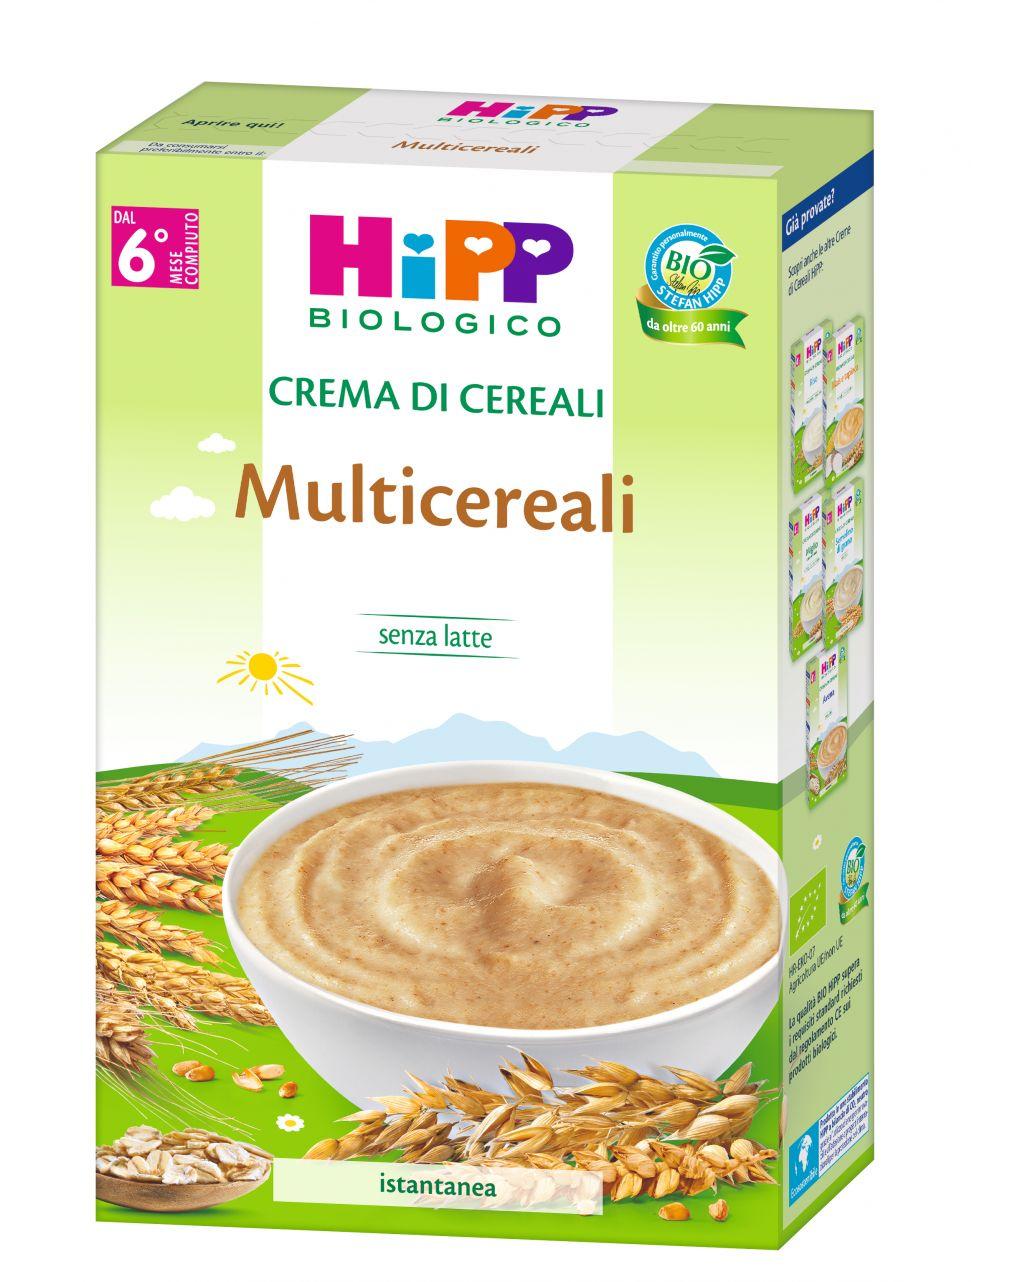 Hipp - crema multicereali 200g - Hipp